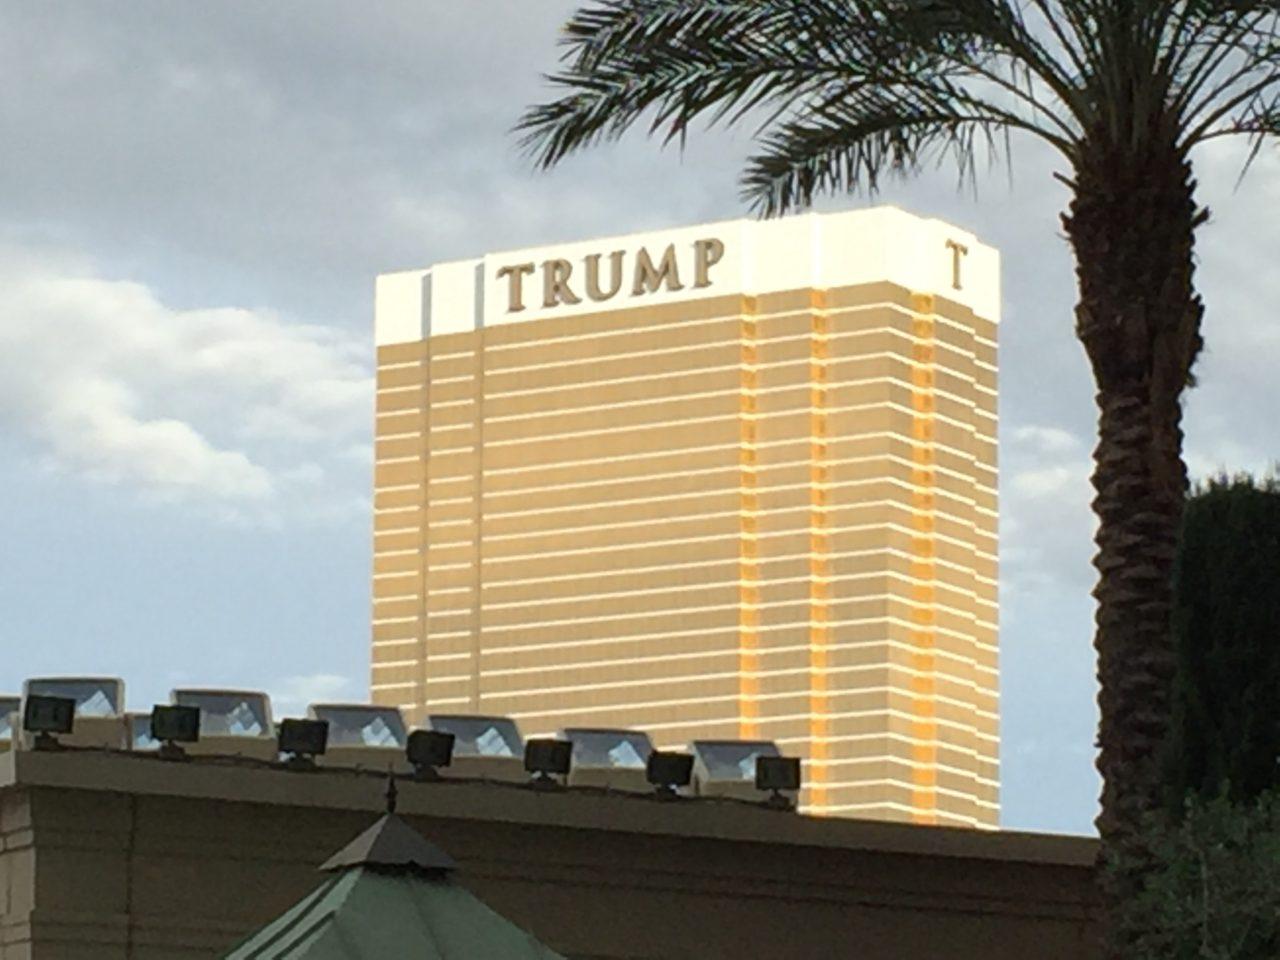 Arsonist Sets Trump International Hotel in Las Vegas on Fire - Breitbart